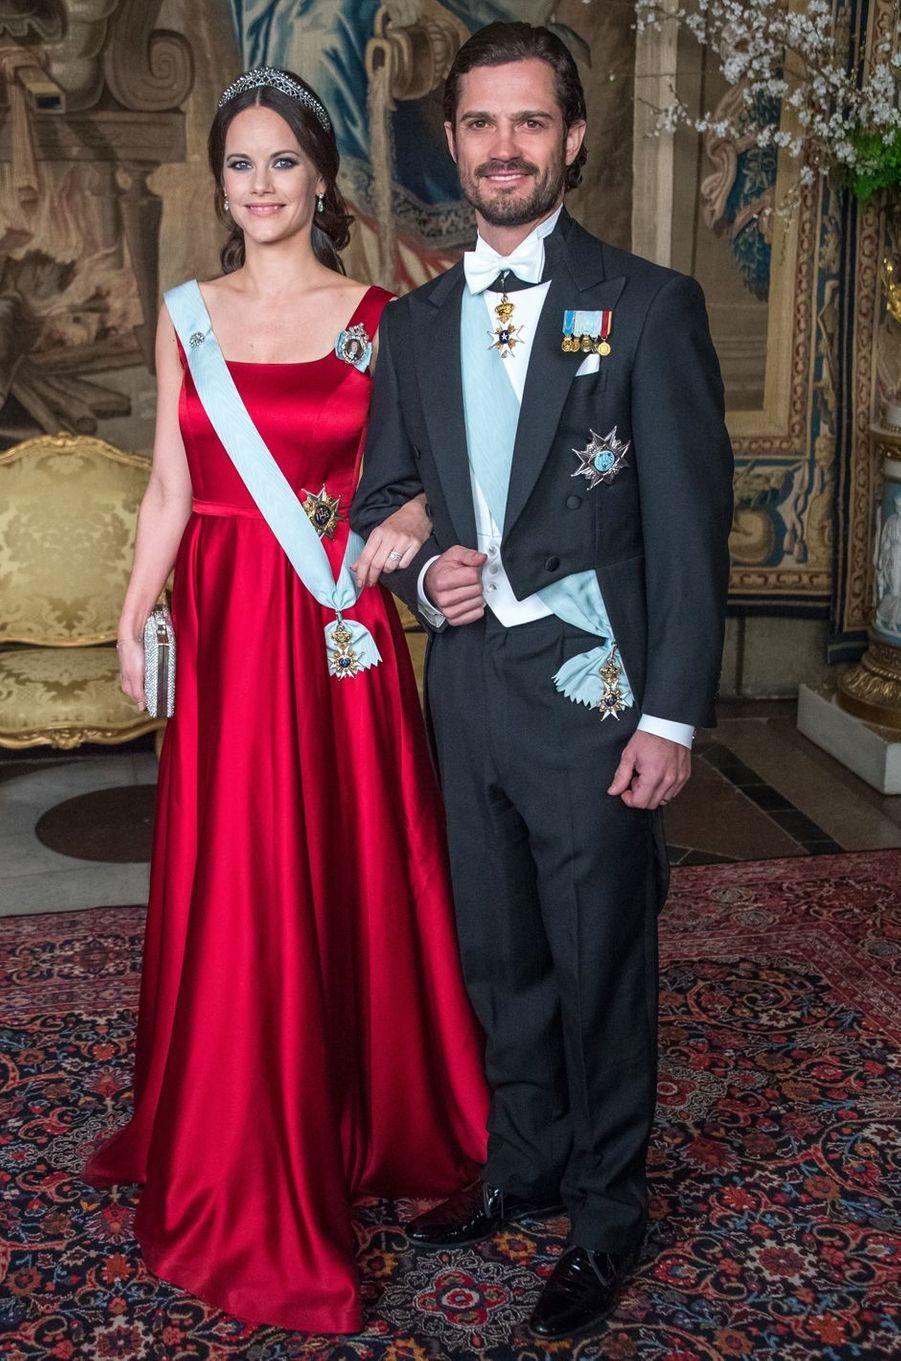 La princesse Sofia de Suède le 23 mars 2017